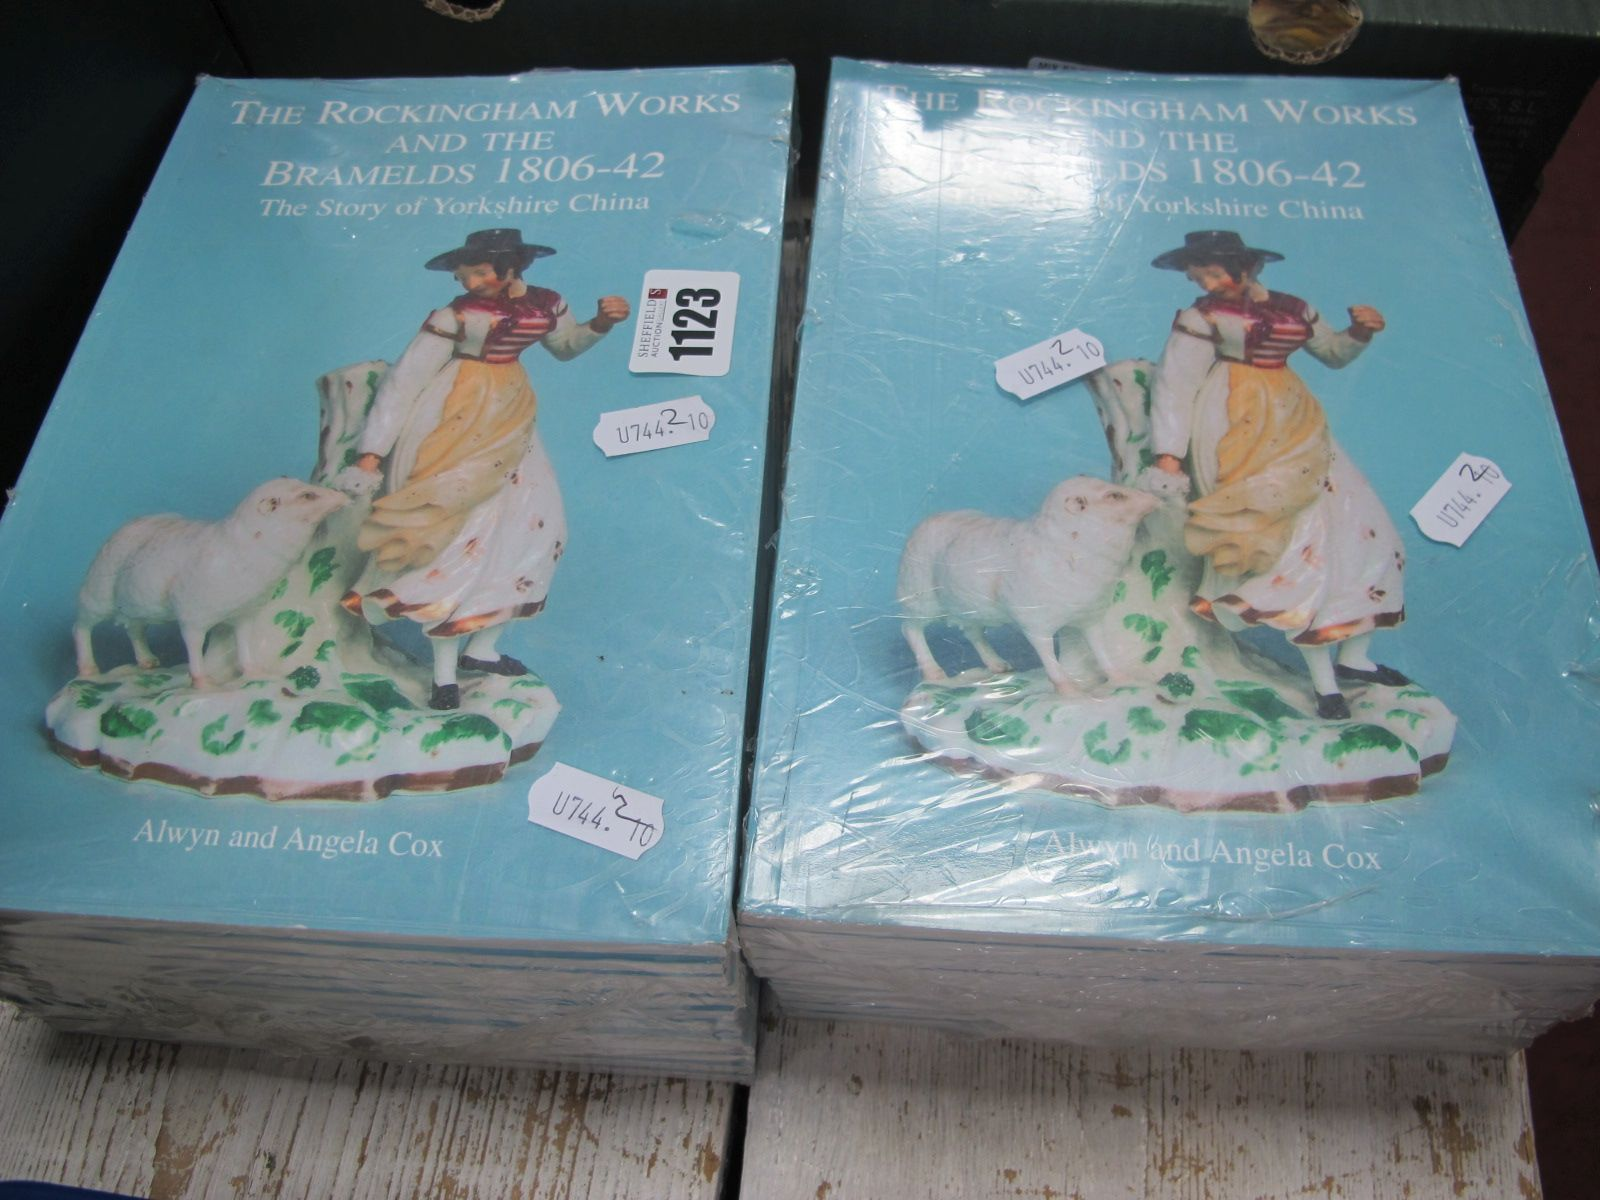 Alwyn and Angela Cox, The Rockingham Works and The Bramelds 1806-42, twenty four editions.